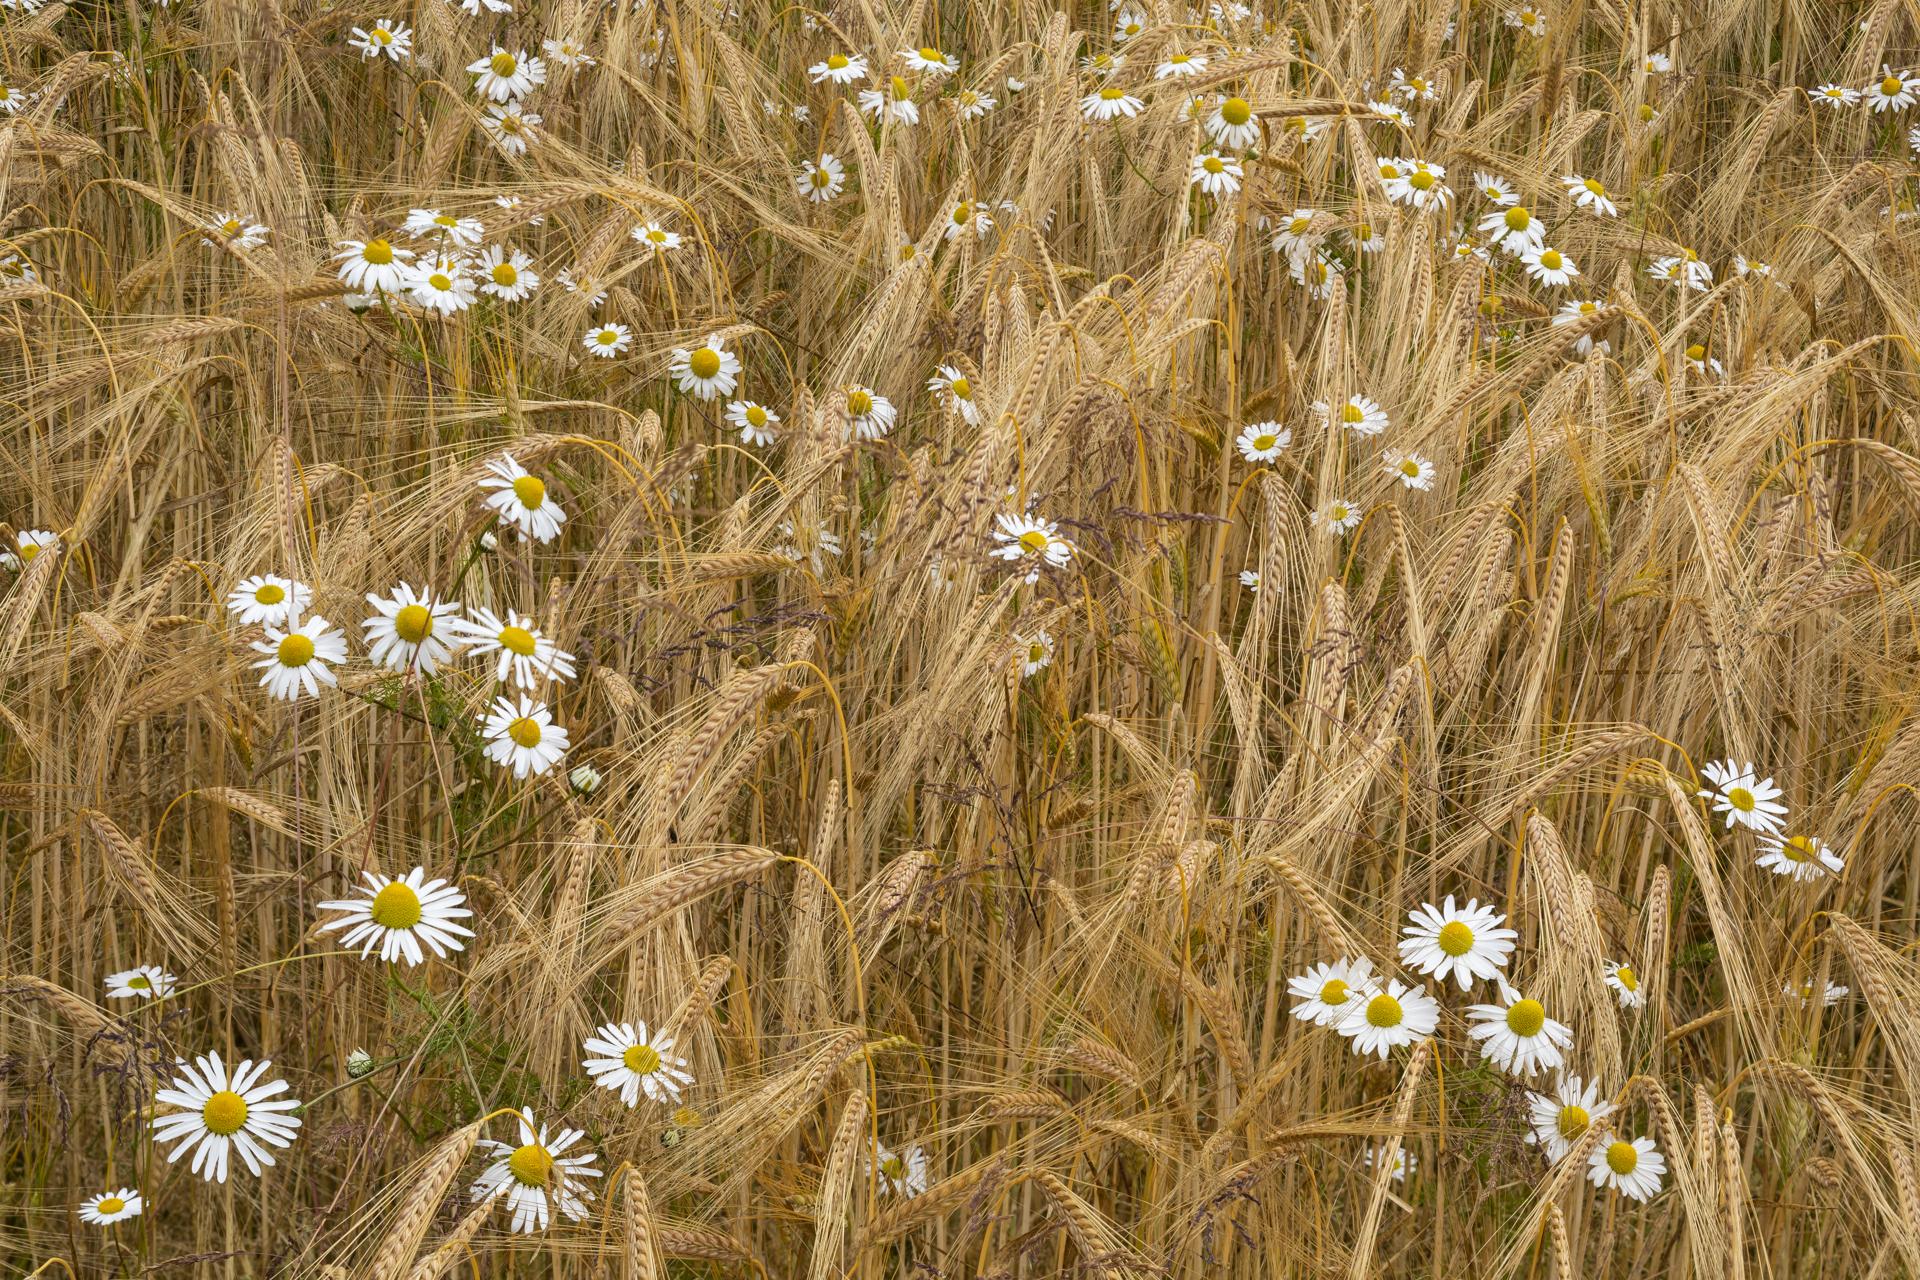 Giant Daisy (Leucanthemella serotina) and Barley, Main of Bridgeton, Scotland